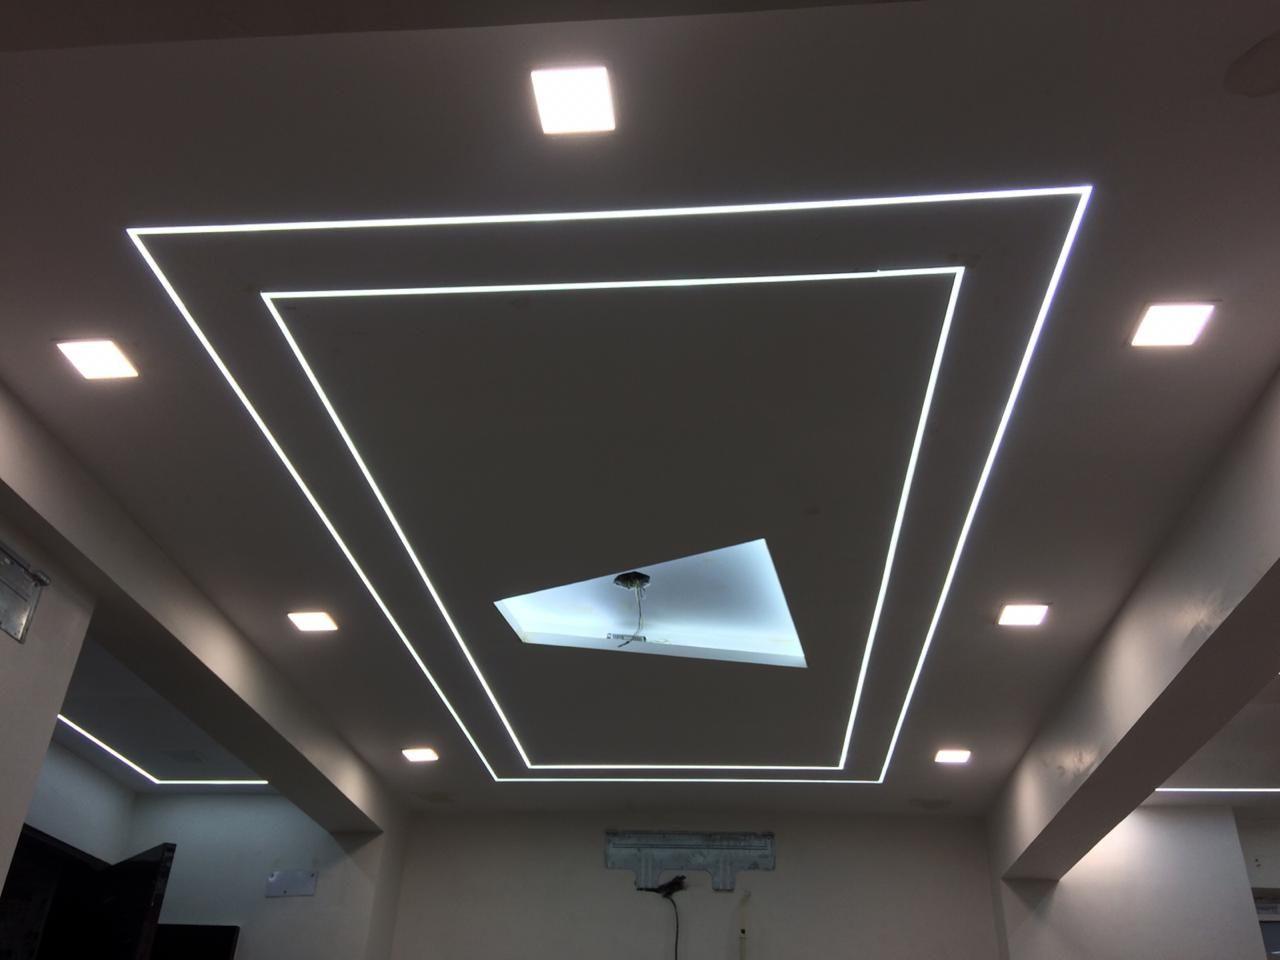 Elegant Linear Lighting Design In Pop Roof False Ceiling Design Linear Lighting Ceiling Design